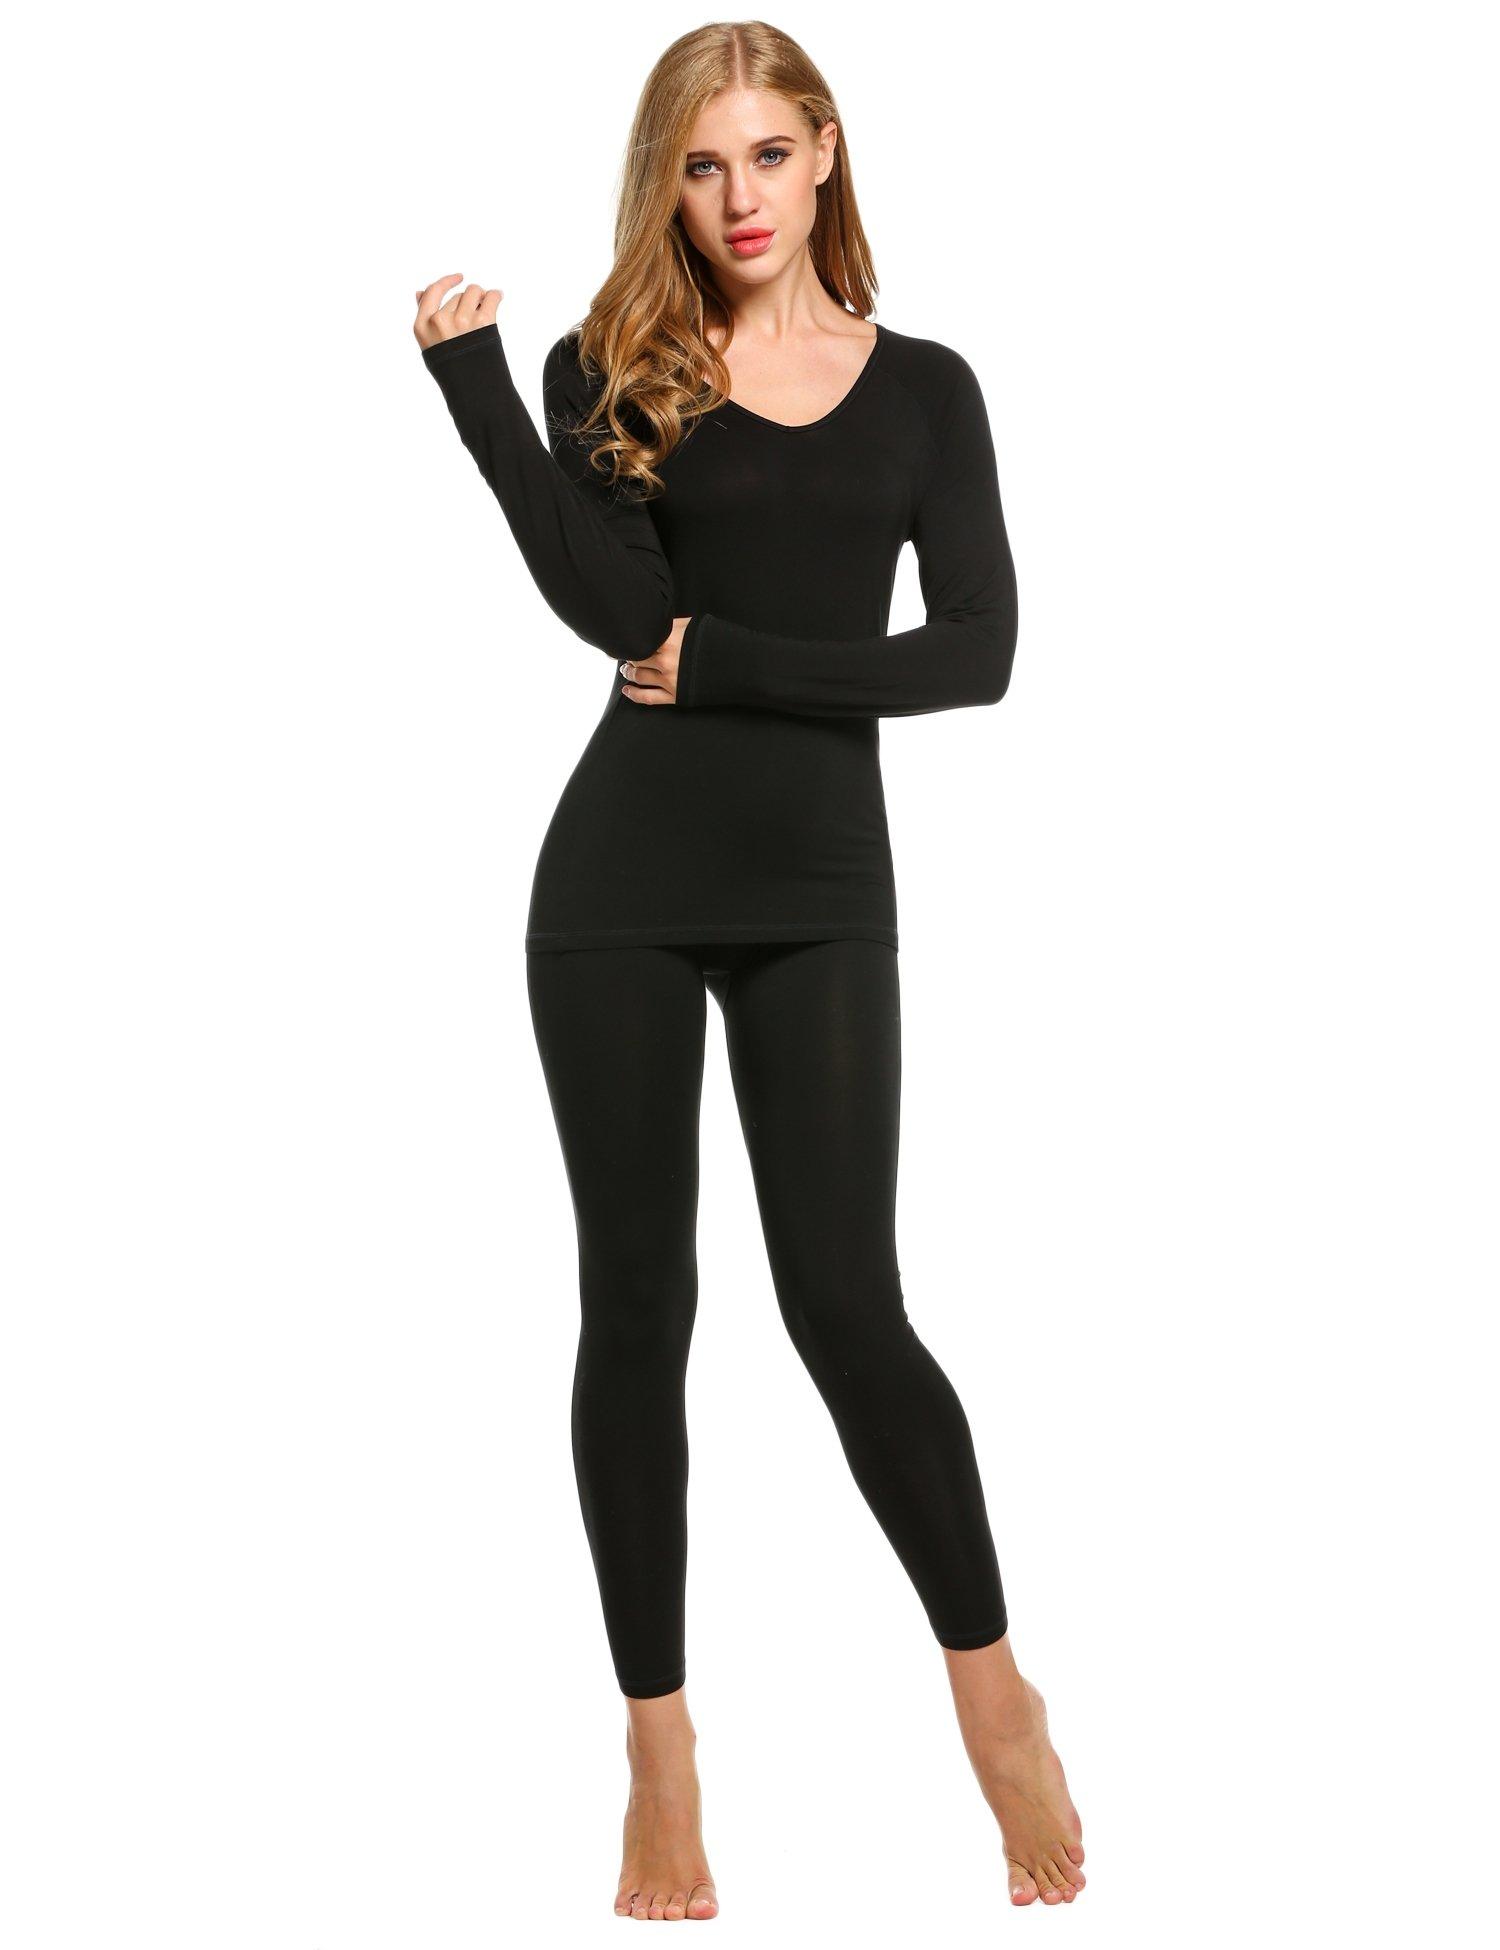 Ekouaer Women Thermal Underwear Set Solid V-Neck Long Sleeve Top and Long Pants Bottom Sleepwear by Ekouaer (Image #2)